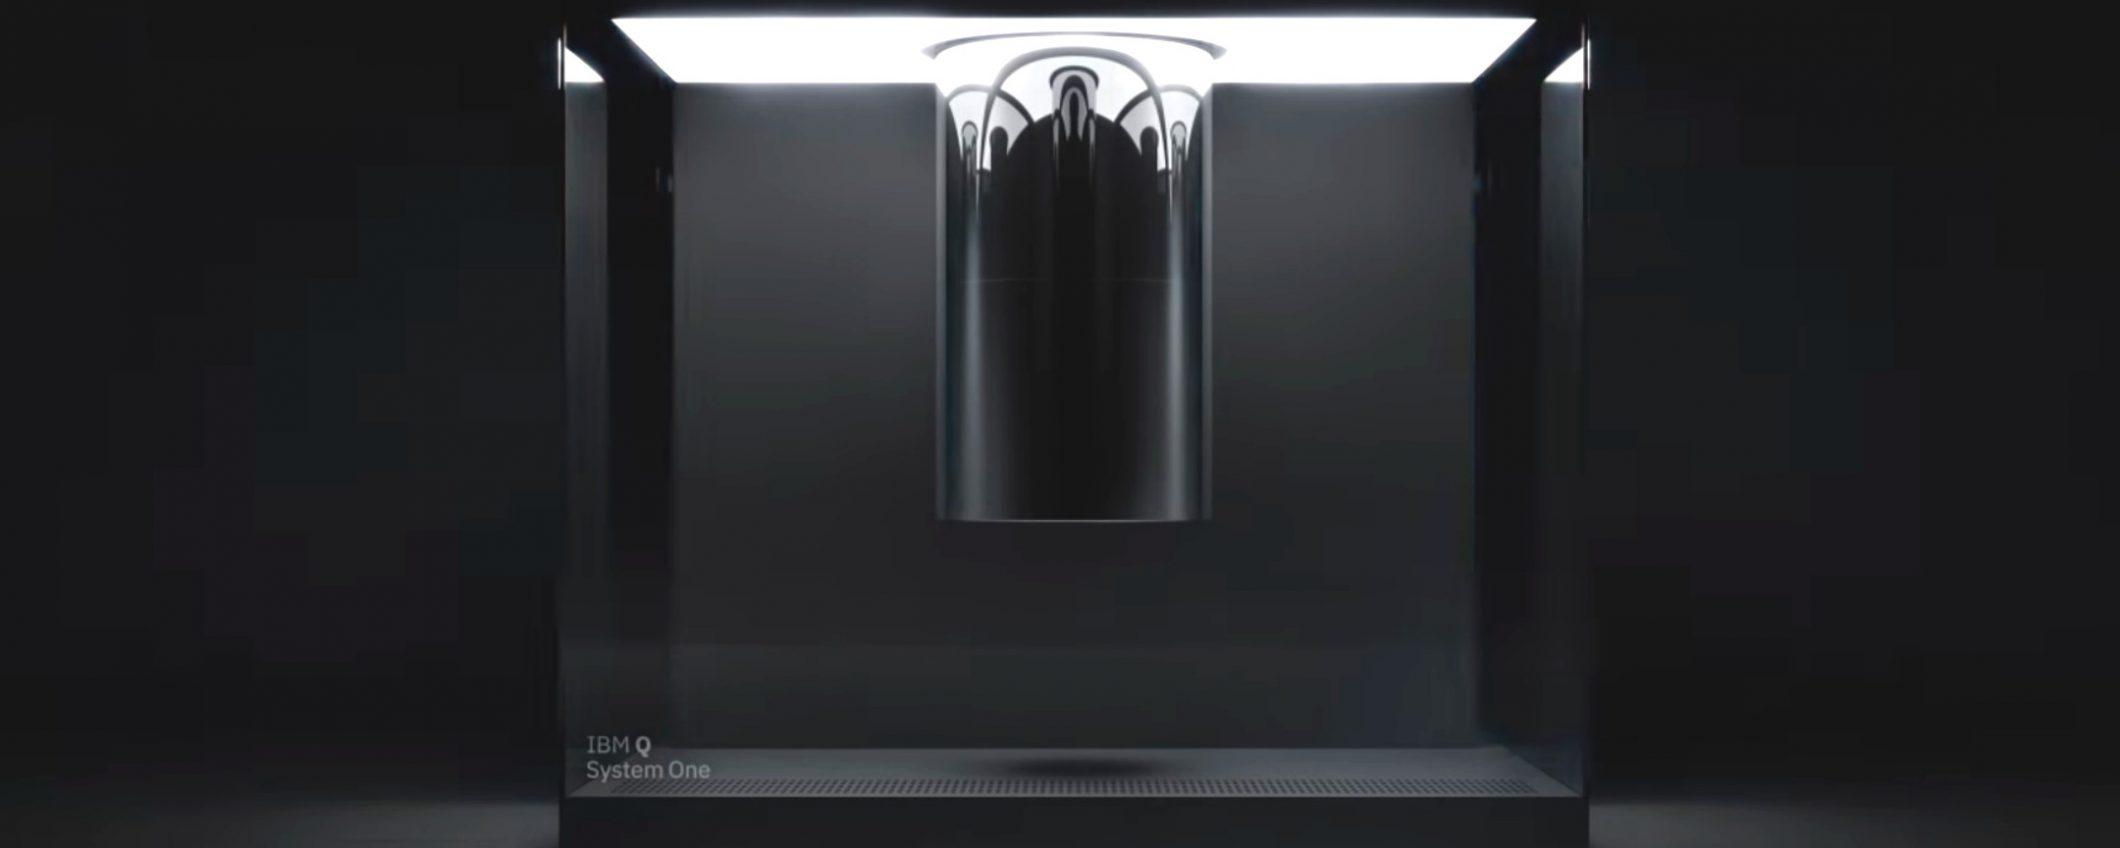 IBM Q: il futuro passa per i computer quantistici thumbnail